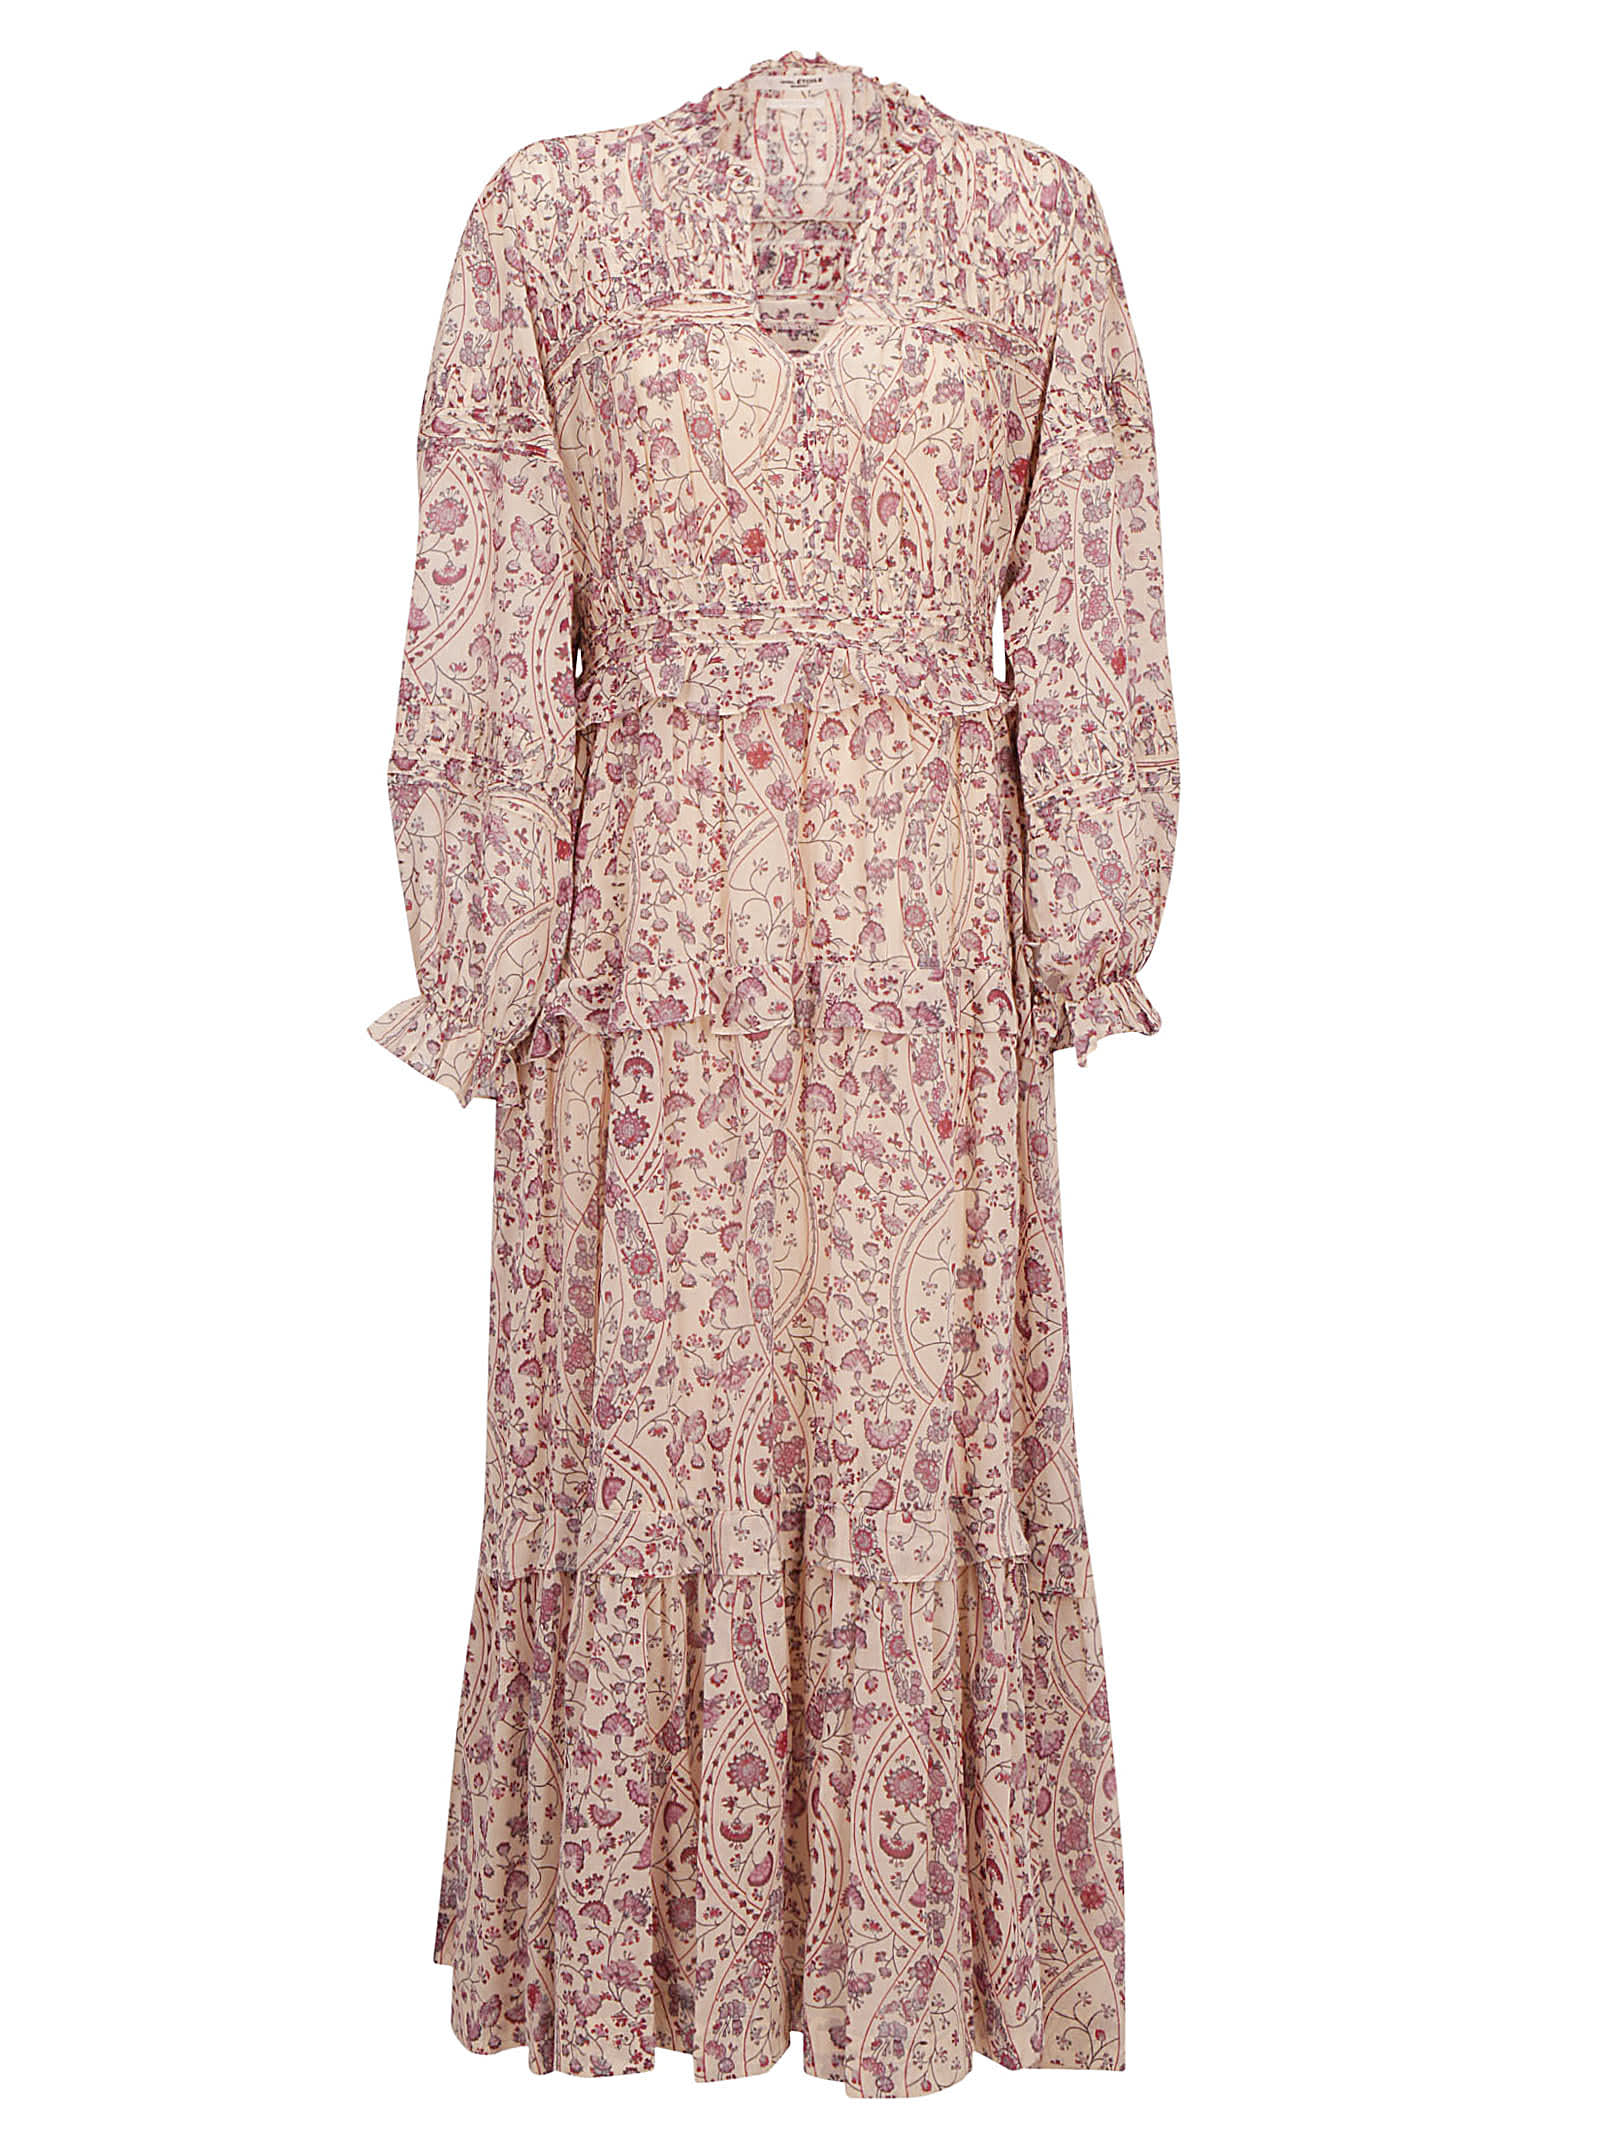 Isabel Marant Likoya Dress